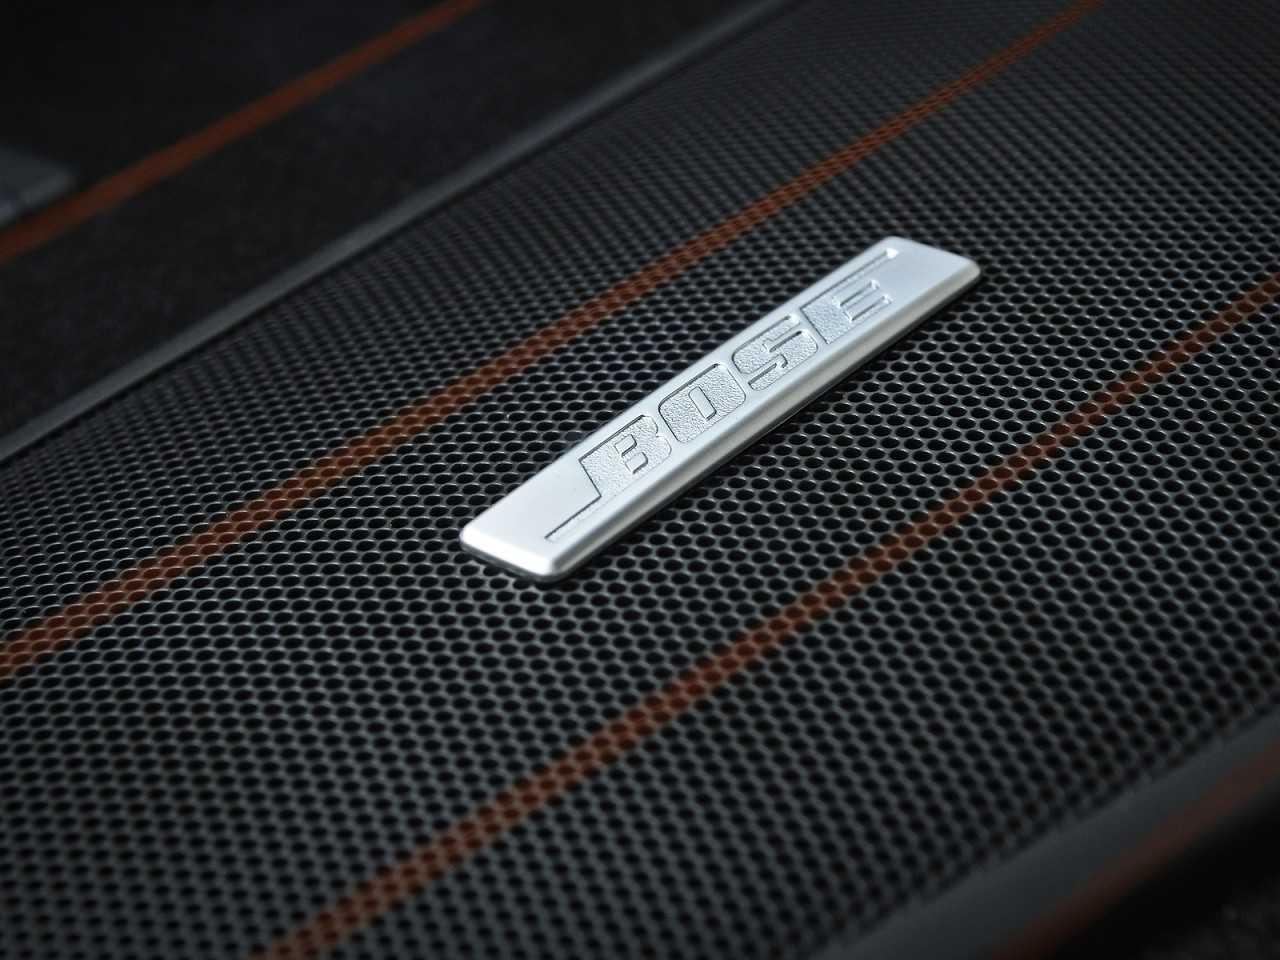 NissanSentra 2017 - outros